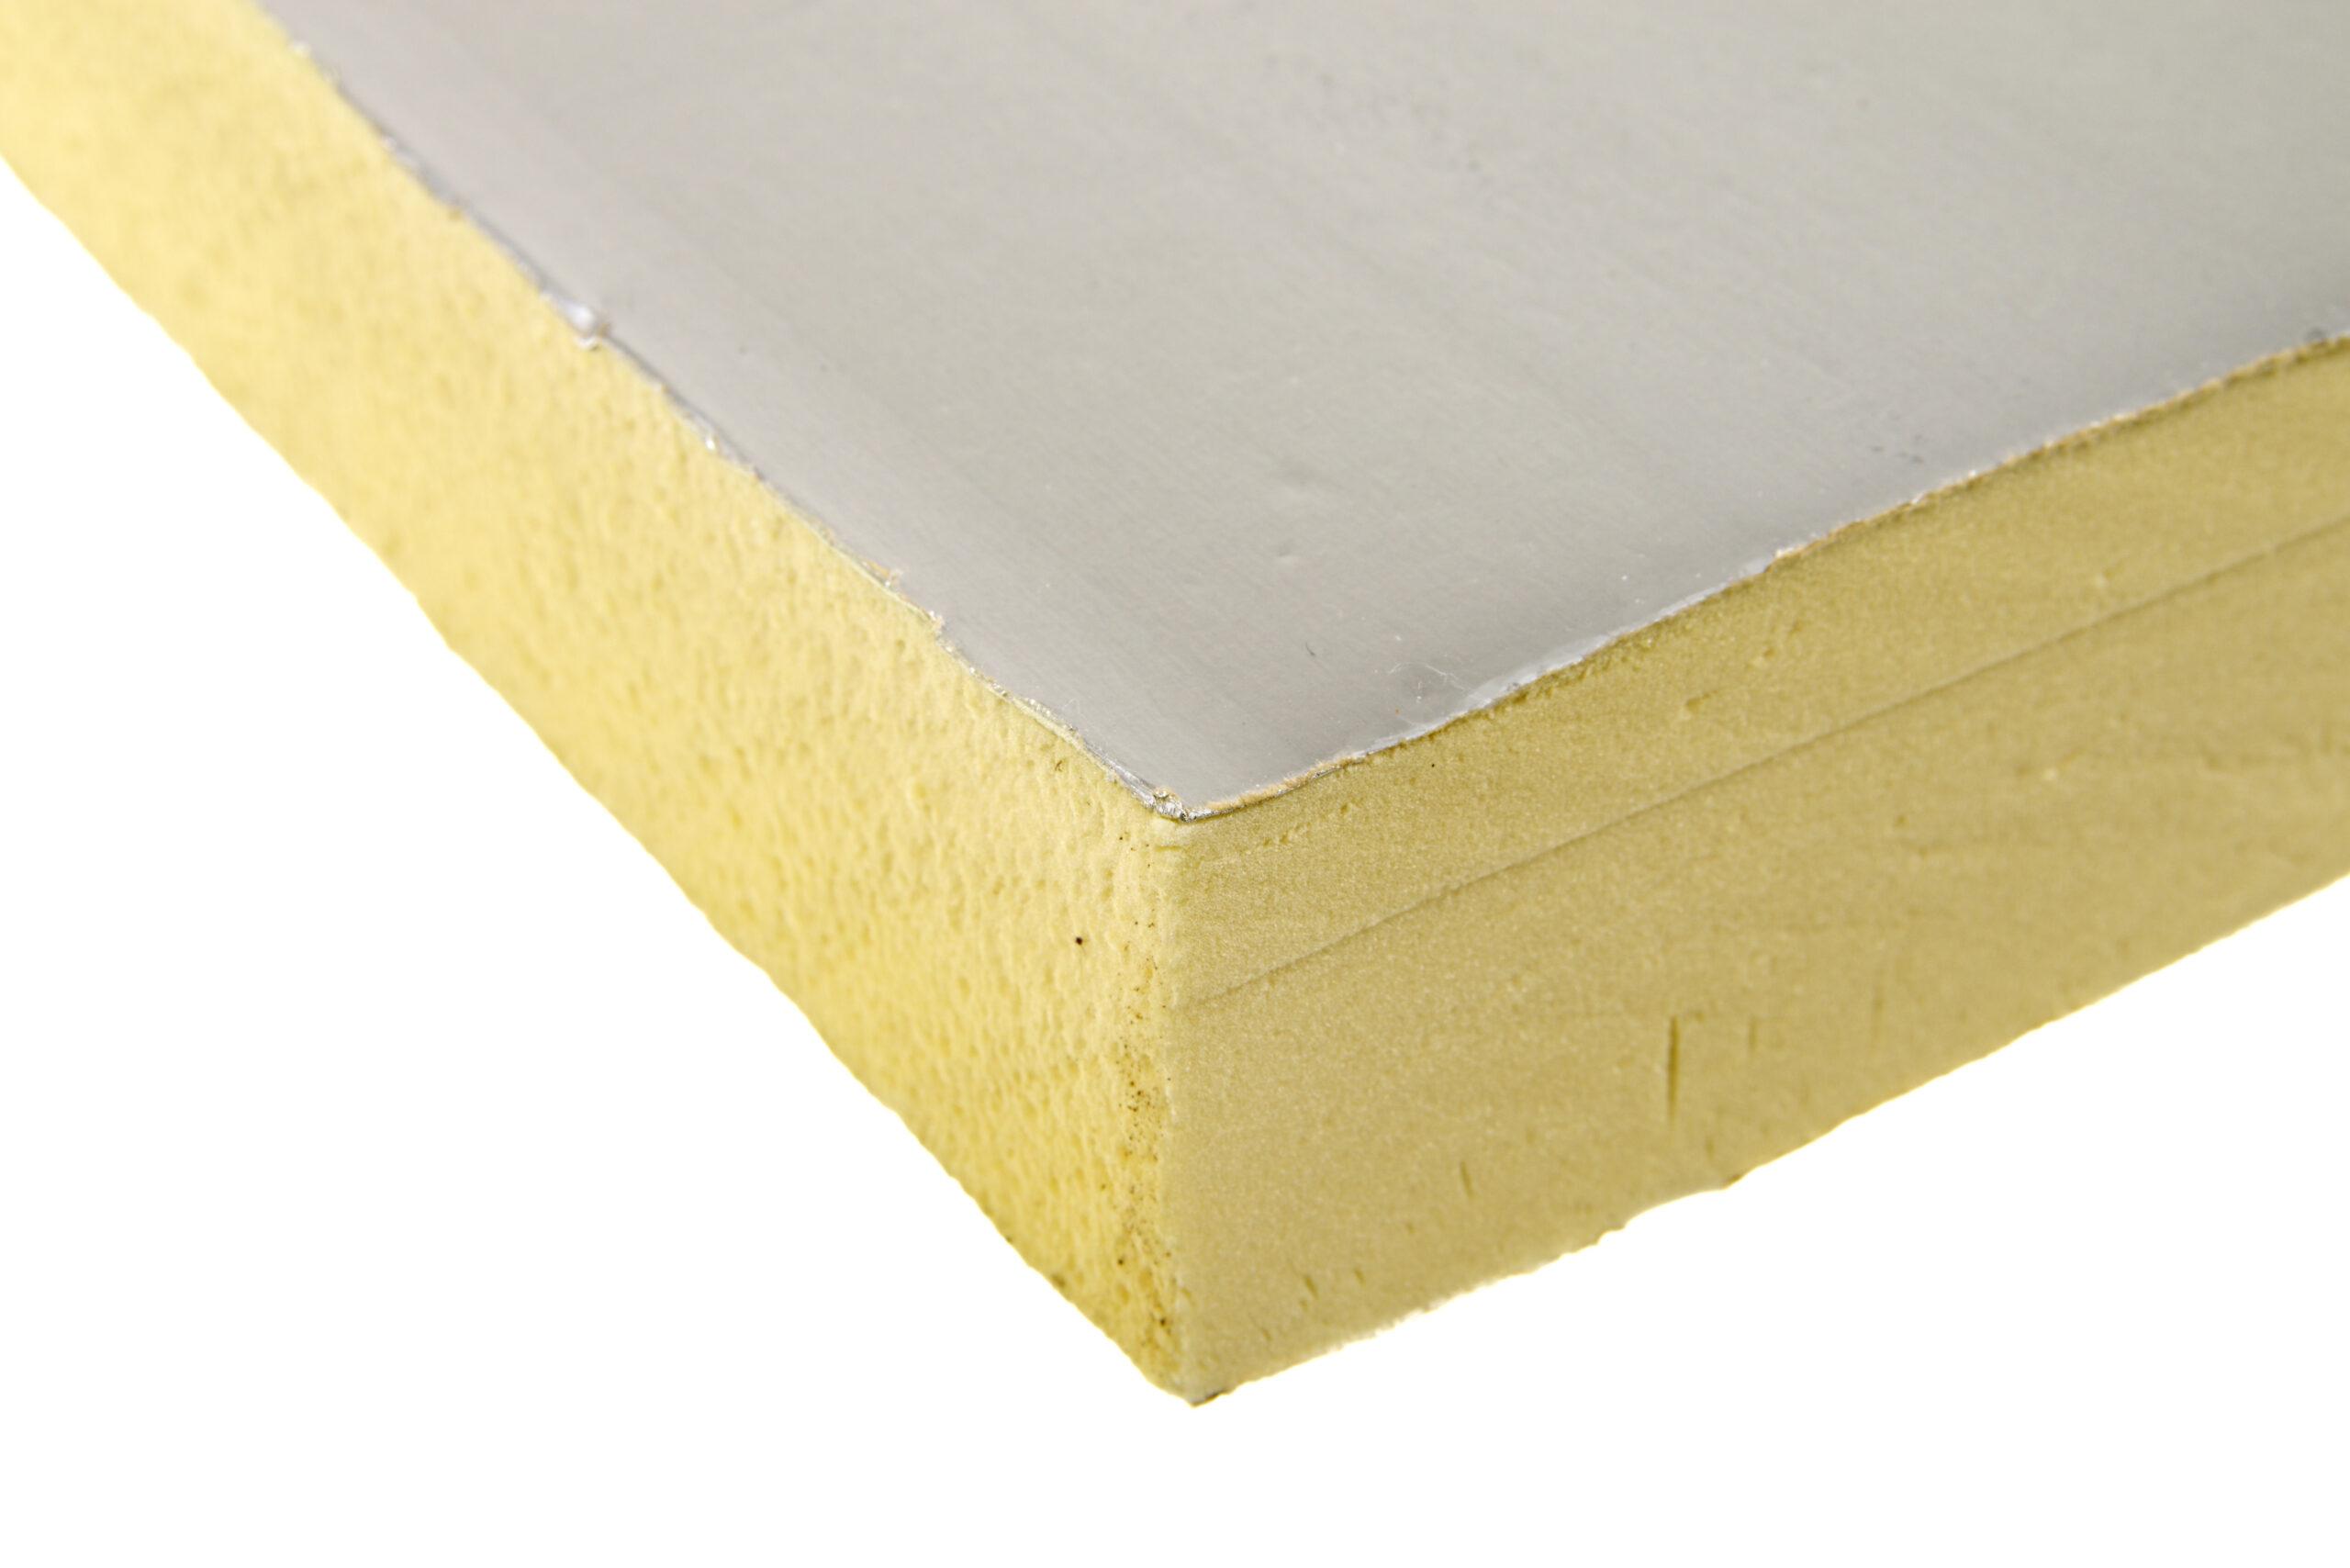 ShieldBOARD PIR Insulation